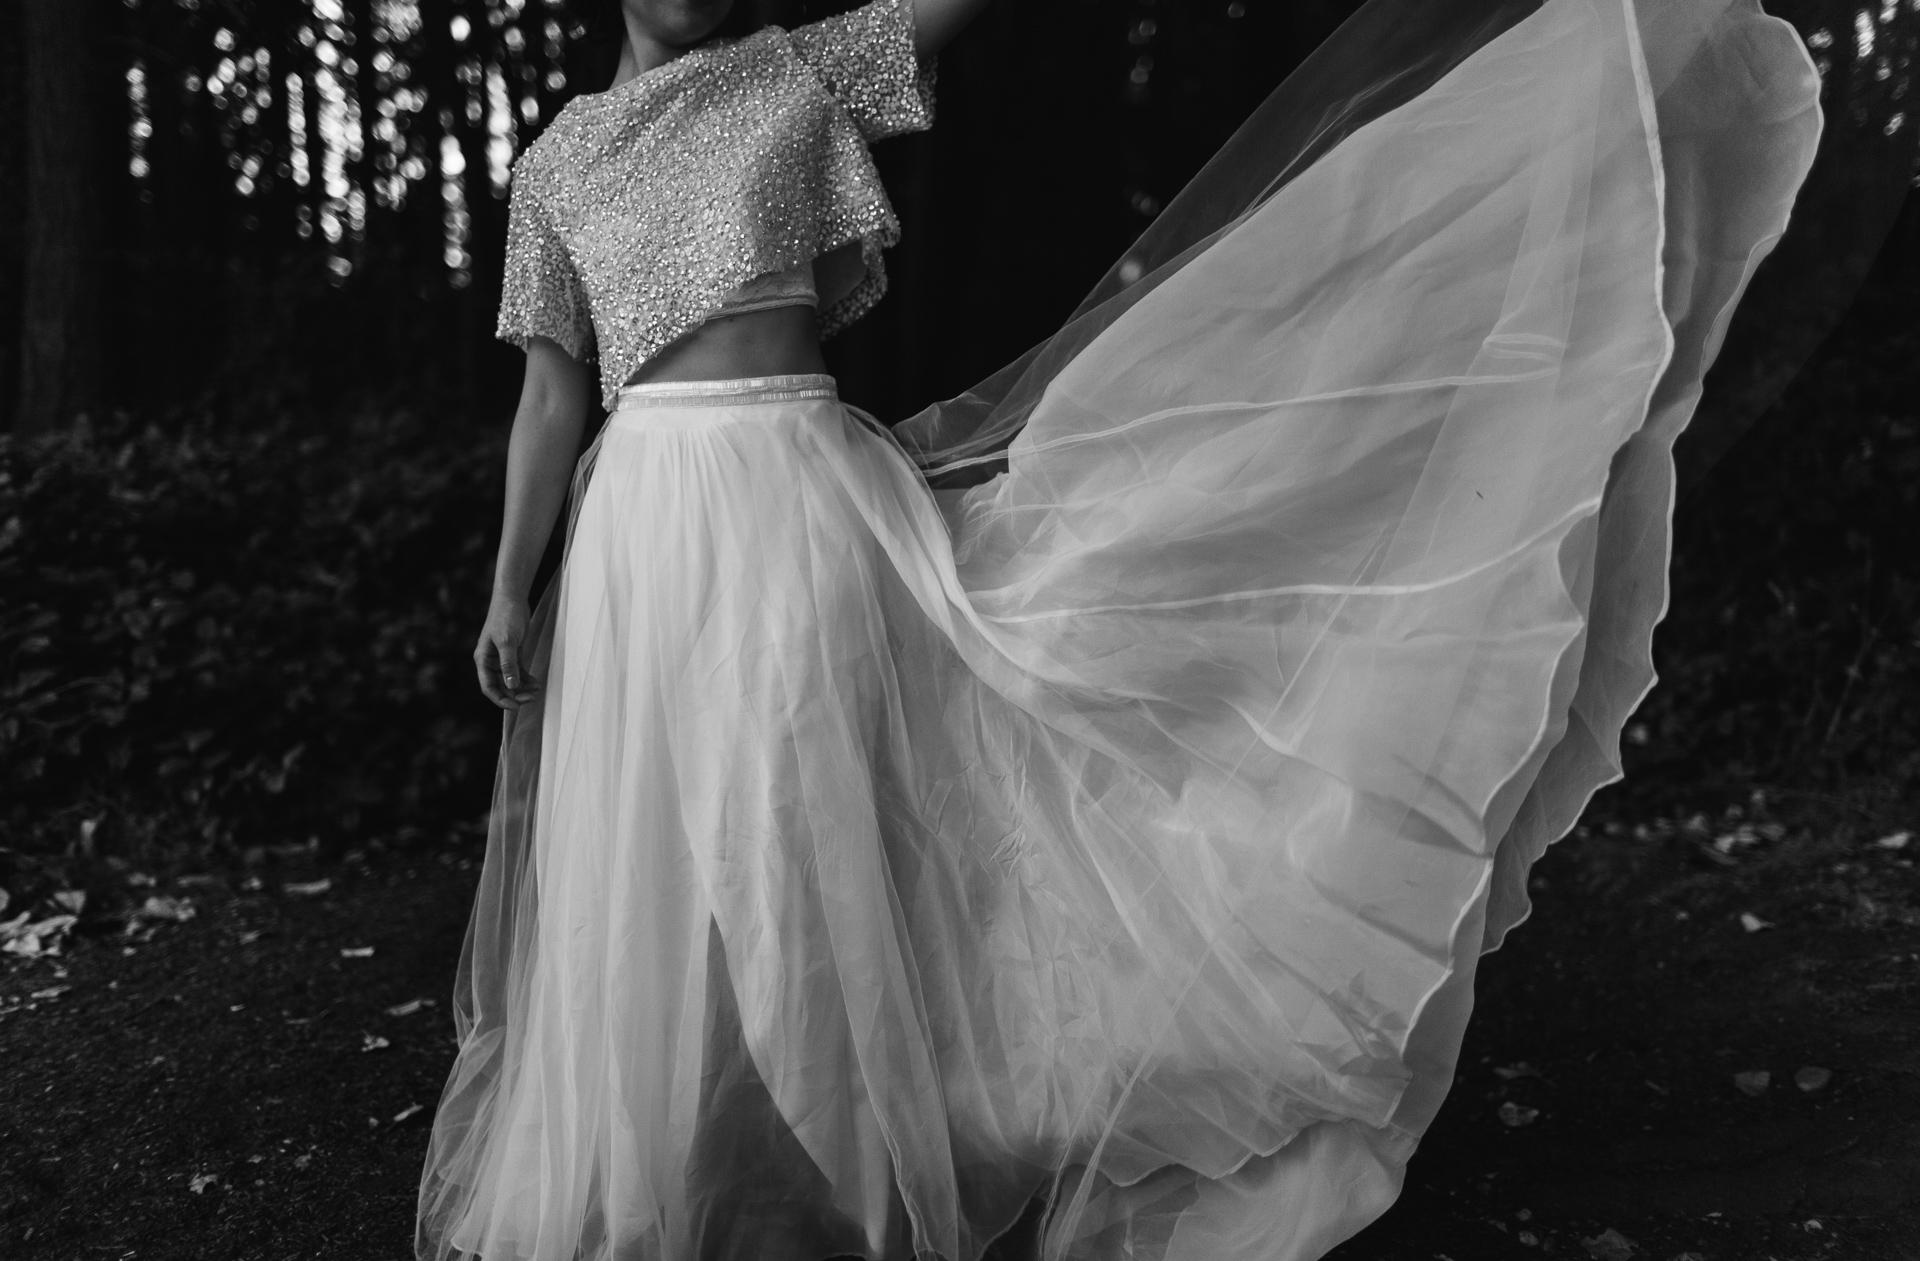 jess-hunter-seattle-artistic-wedding-photographer-4097.jpg